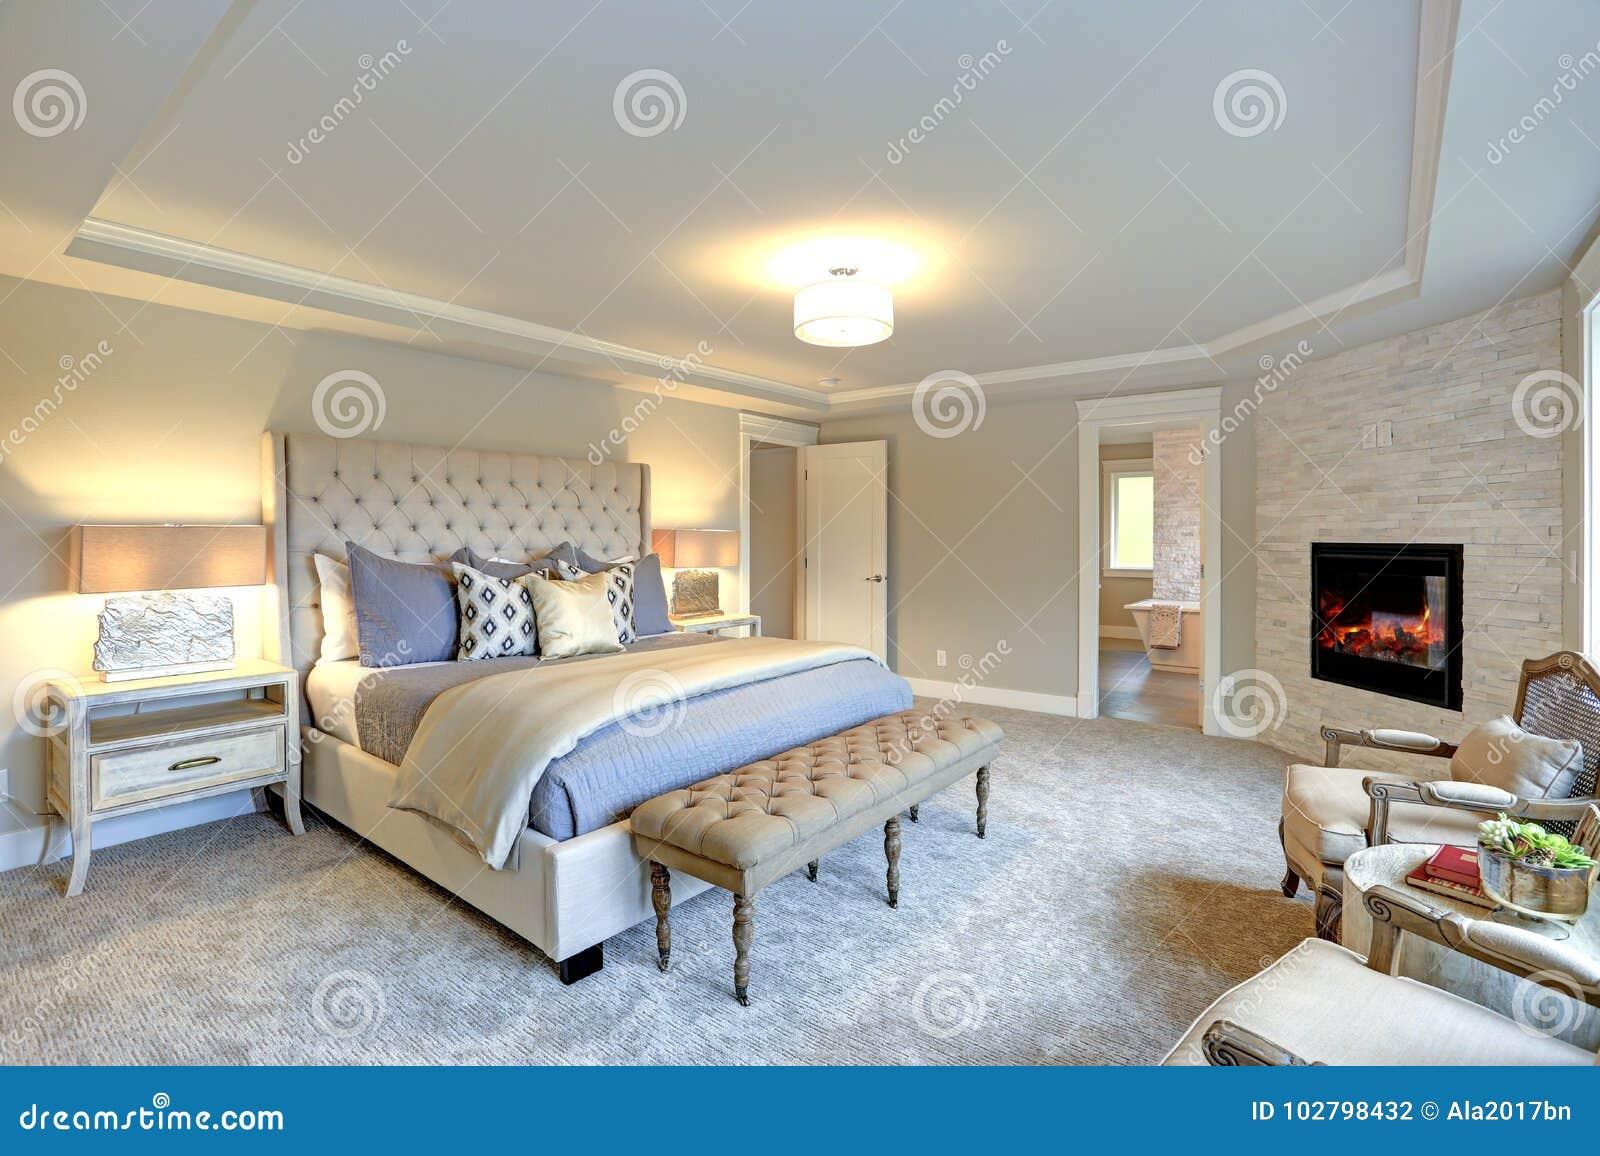 Luxury Master Bedroom Interior Stock Photo Image Of Bright Pillow 102798432